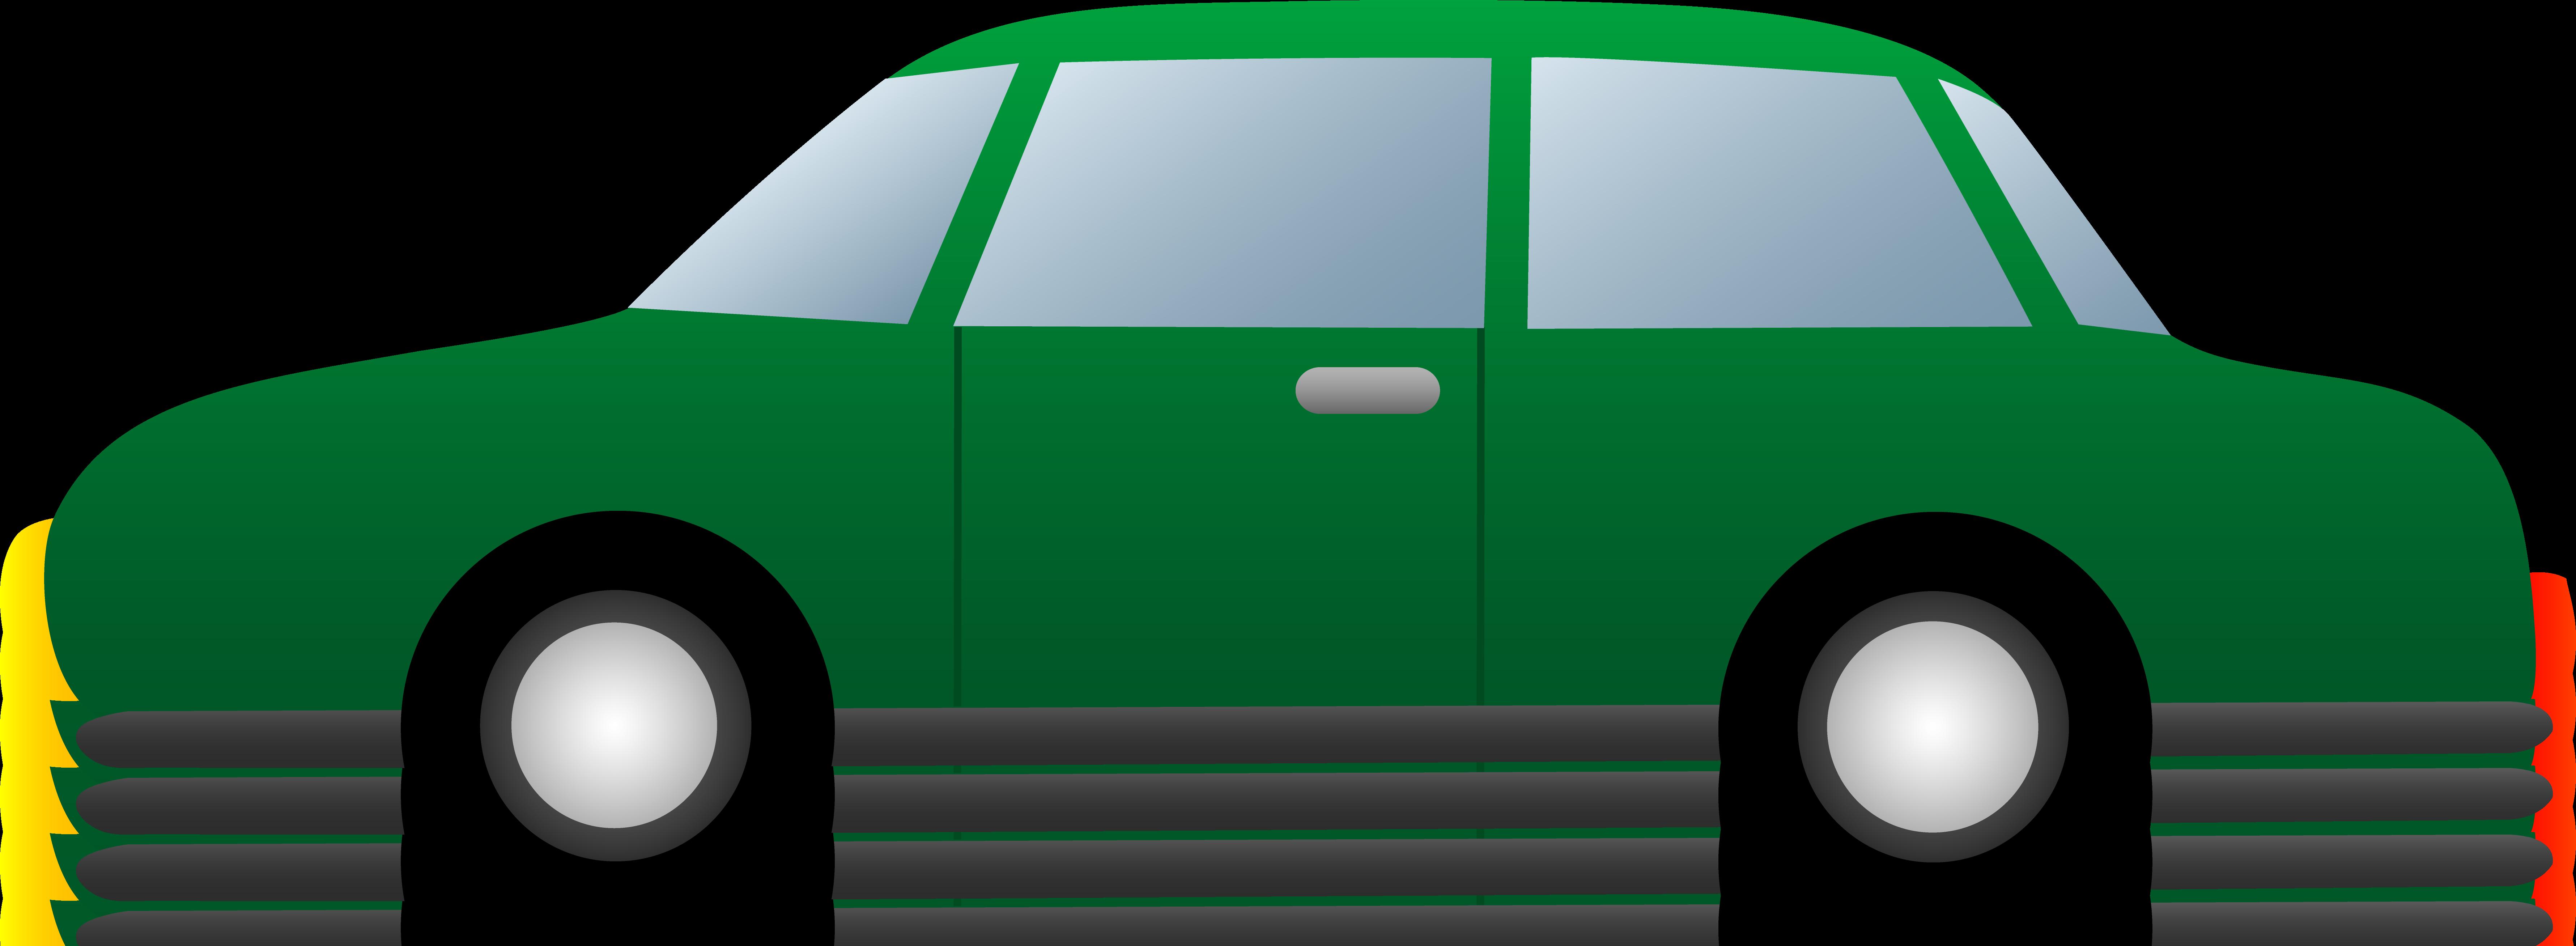 7122x2615 Simple Green Car